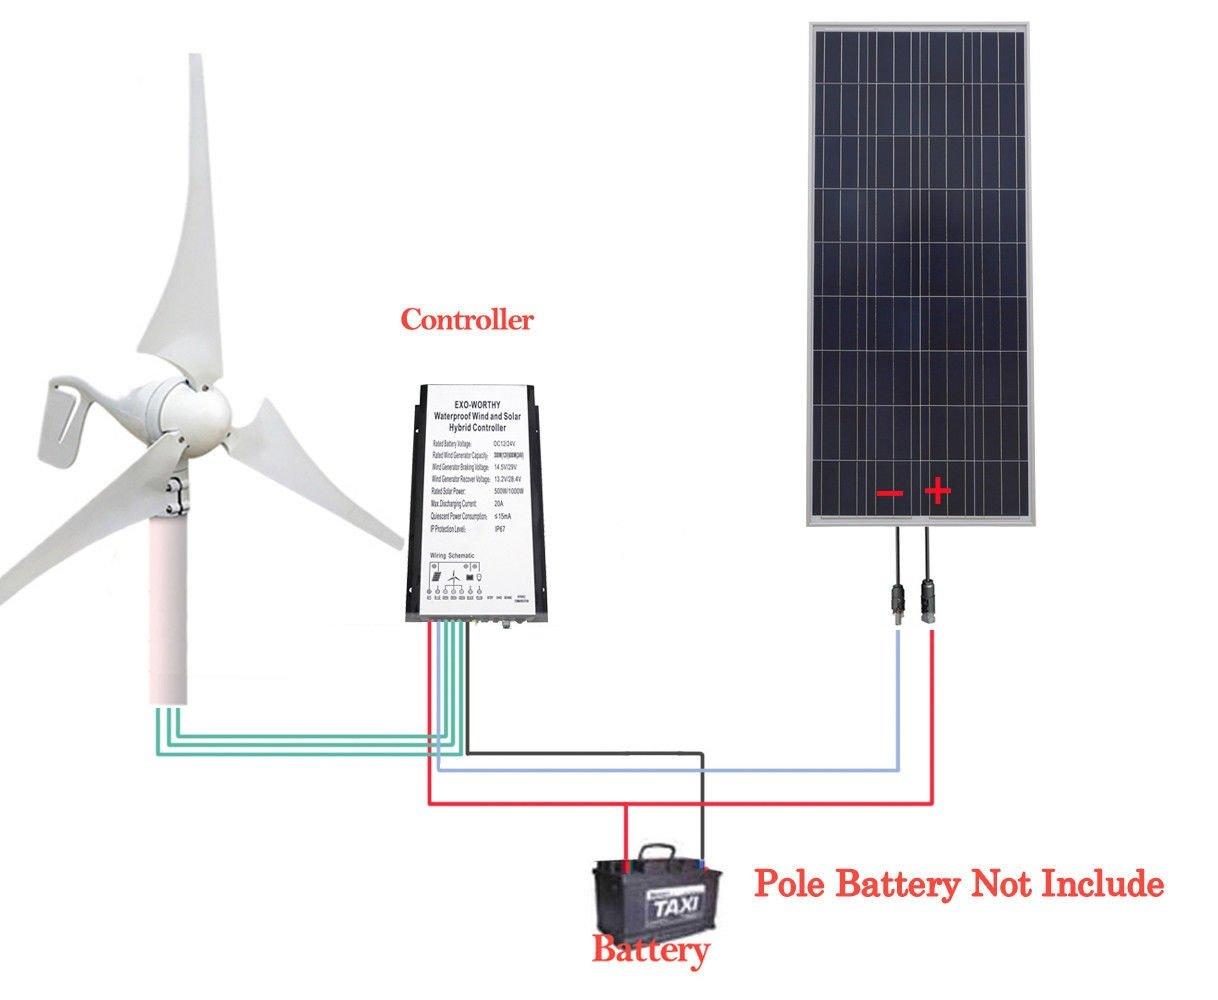 Eco-worthy 550W 12V Wind - Solar System : 400 Watt Wind Turbine Generator + 150W Poly Solar Panel + Controller for Charging Battery